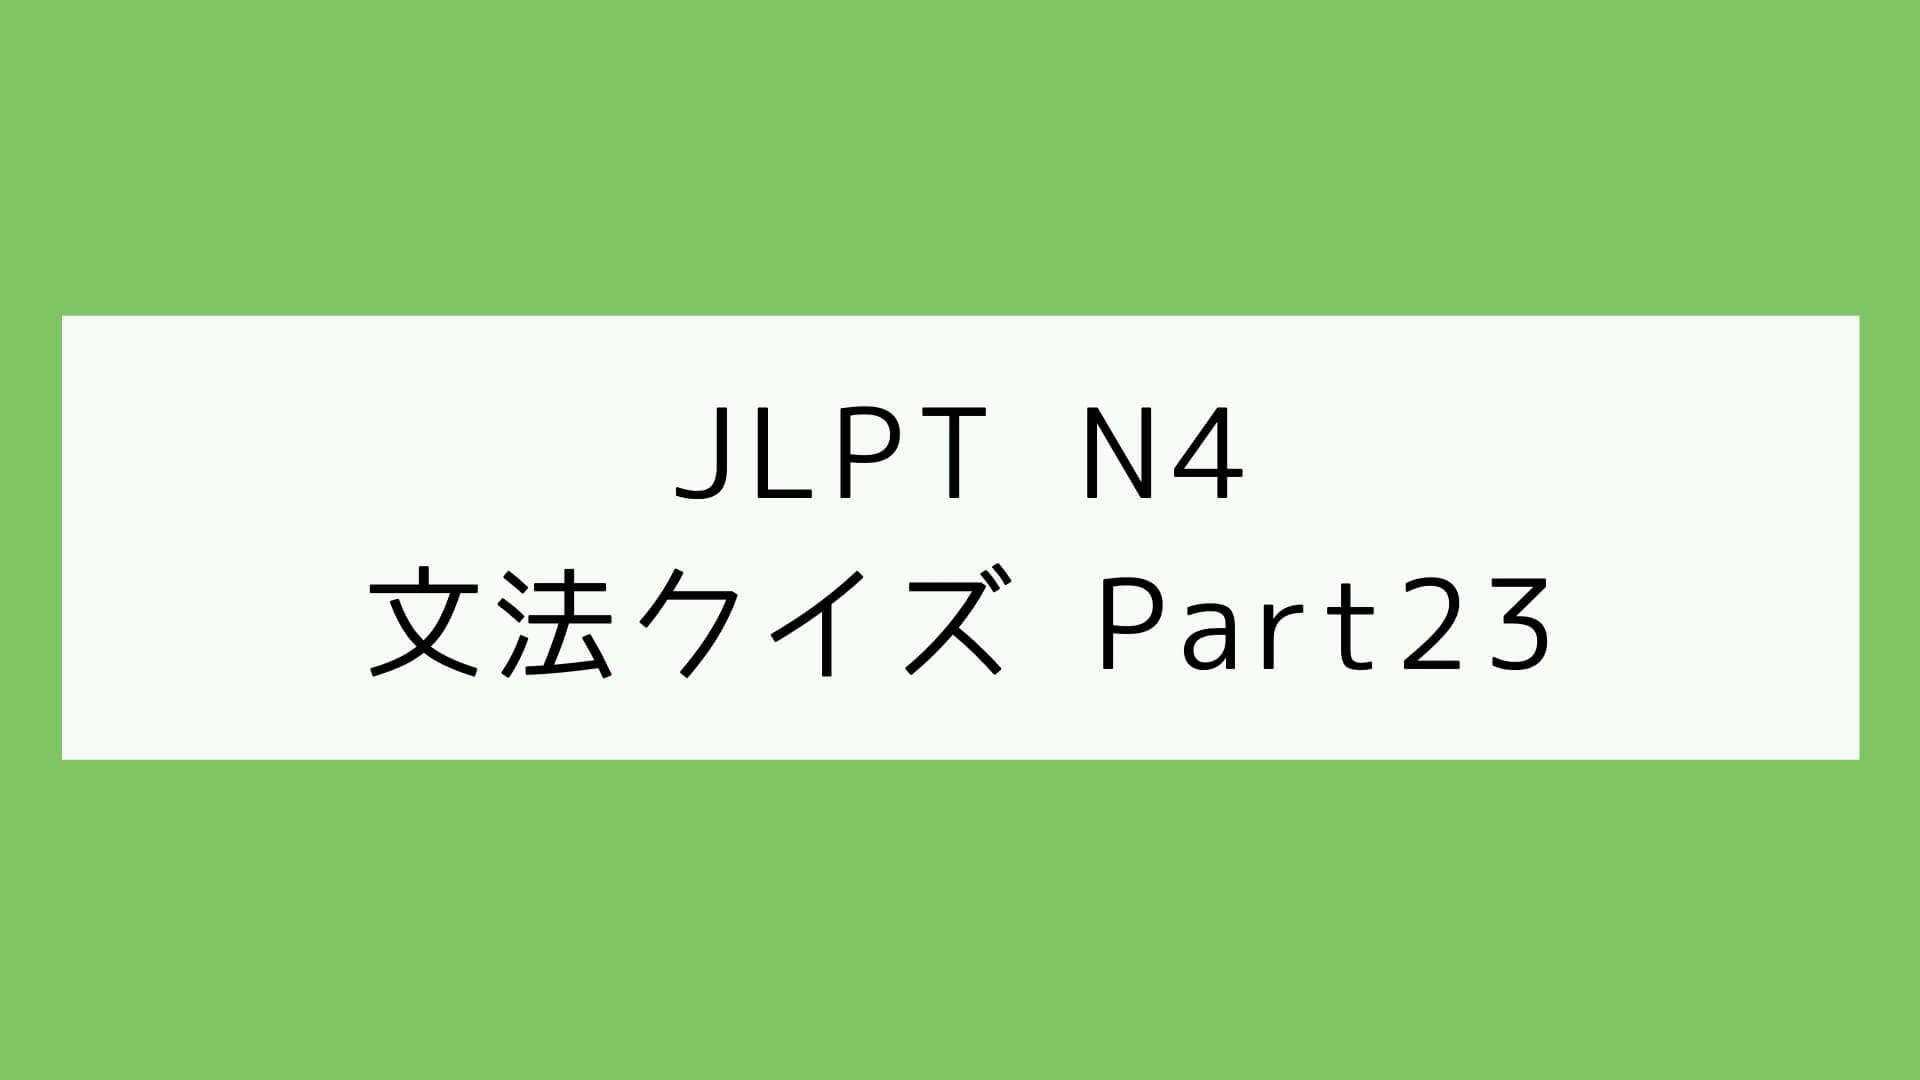 【JLPT N4】文法クイズ Part23